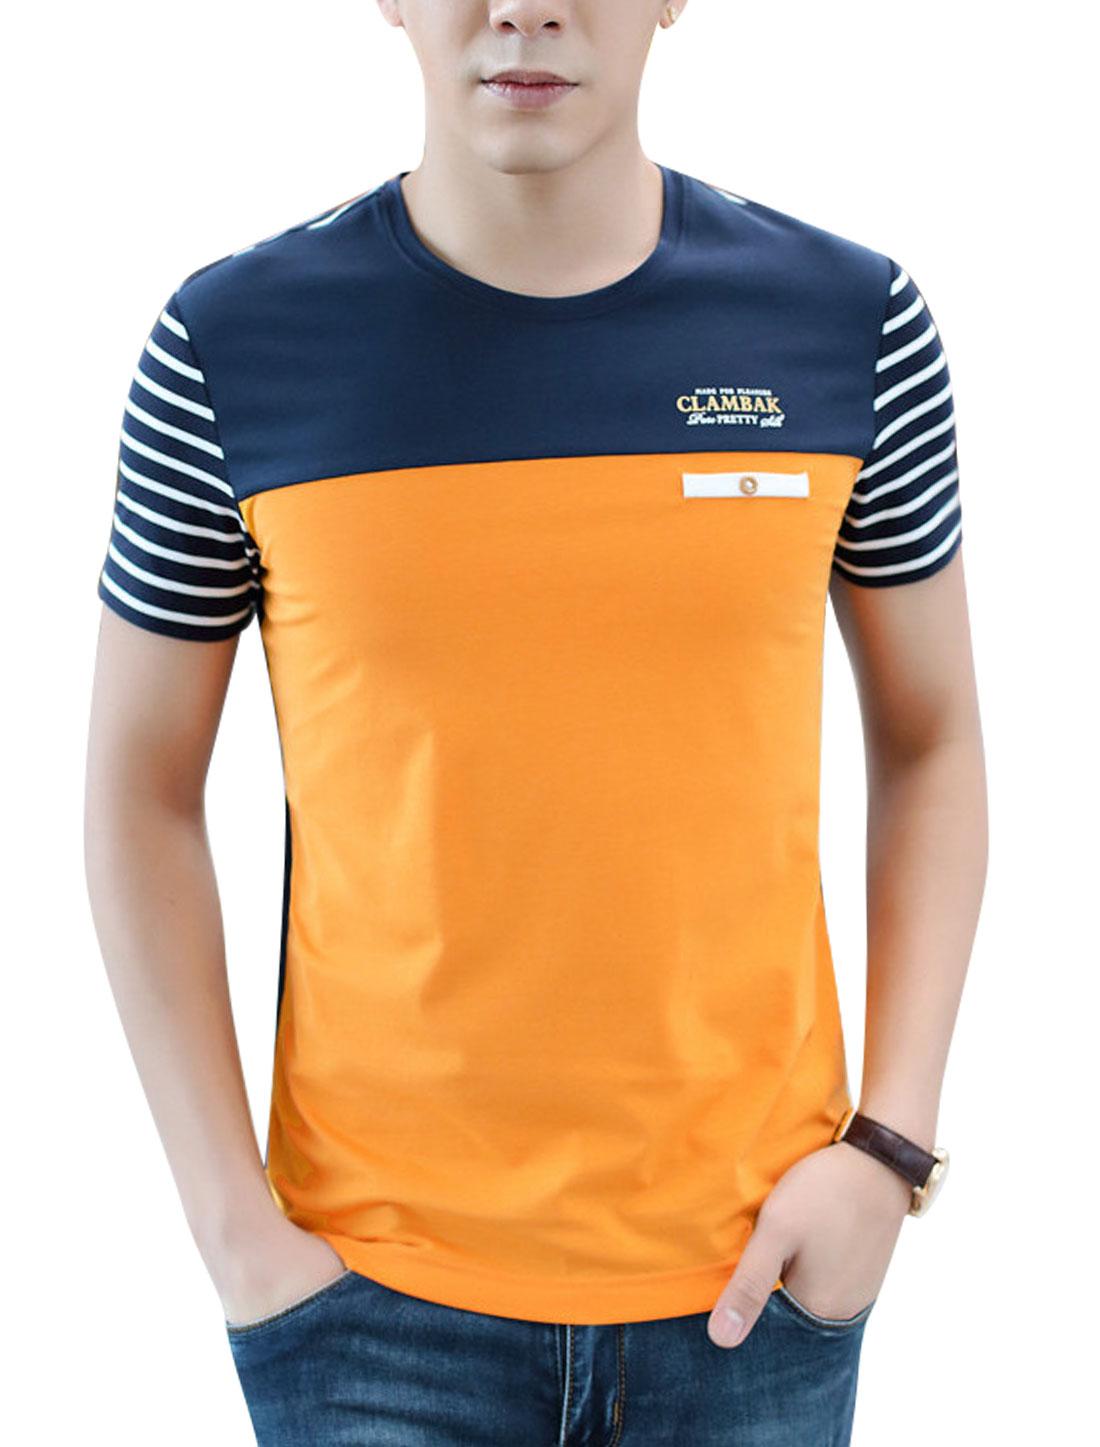 Men Short Sleeve Round Neck Contrast Color Stripes T Shirts Orange Navy Blue M